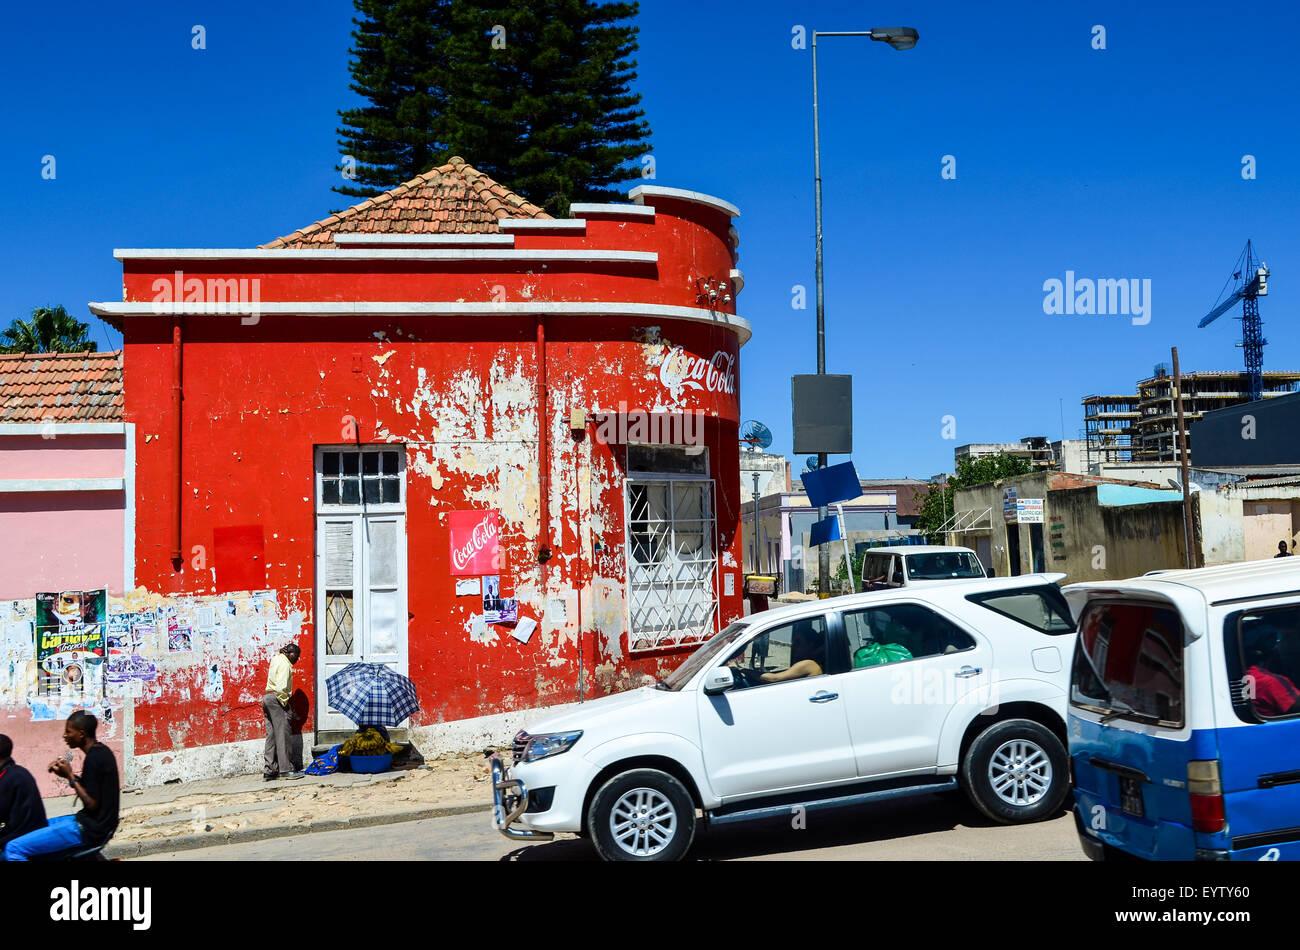 Street view of the city of Lubango, Angola - Stock Image